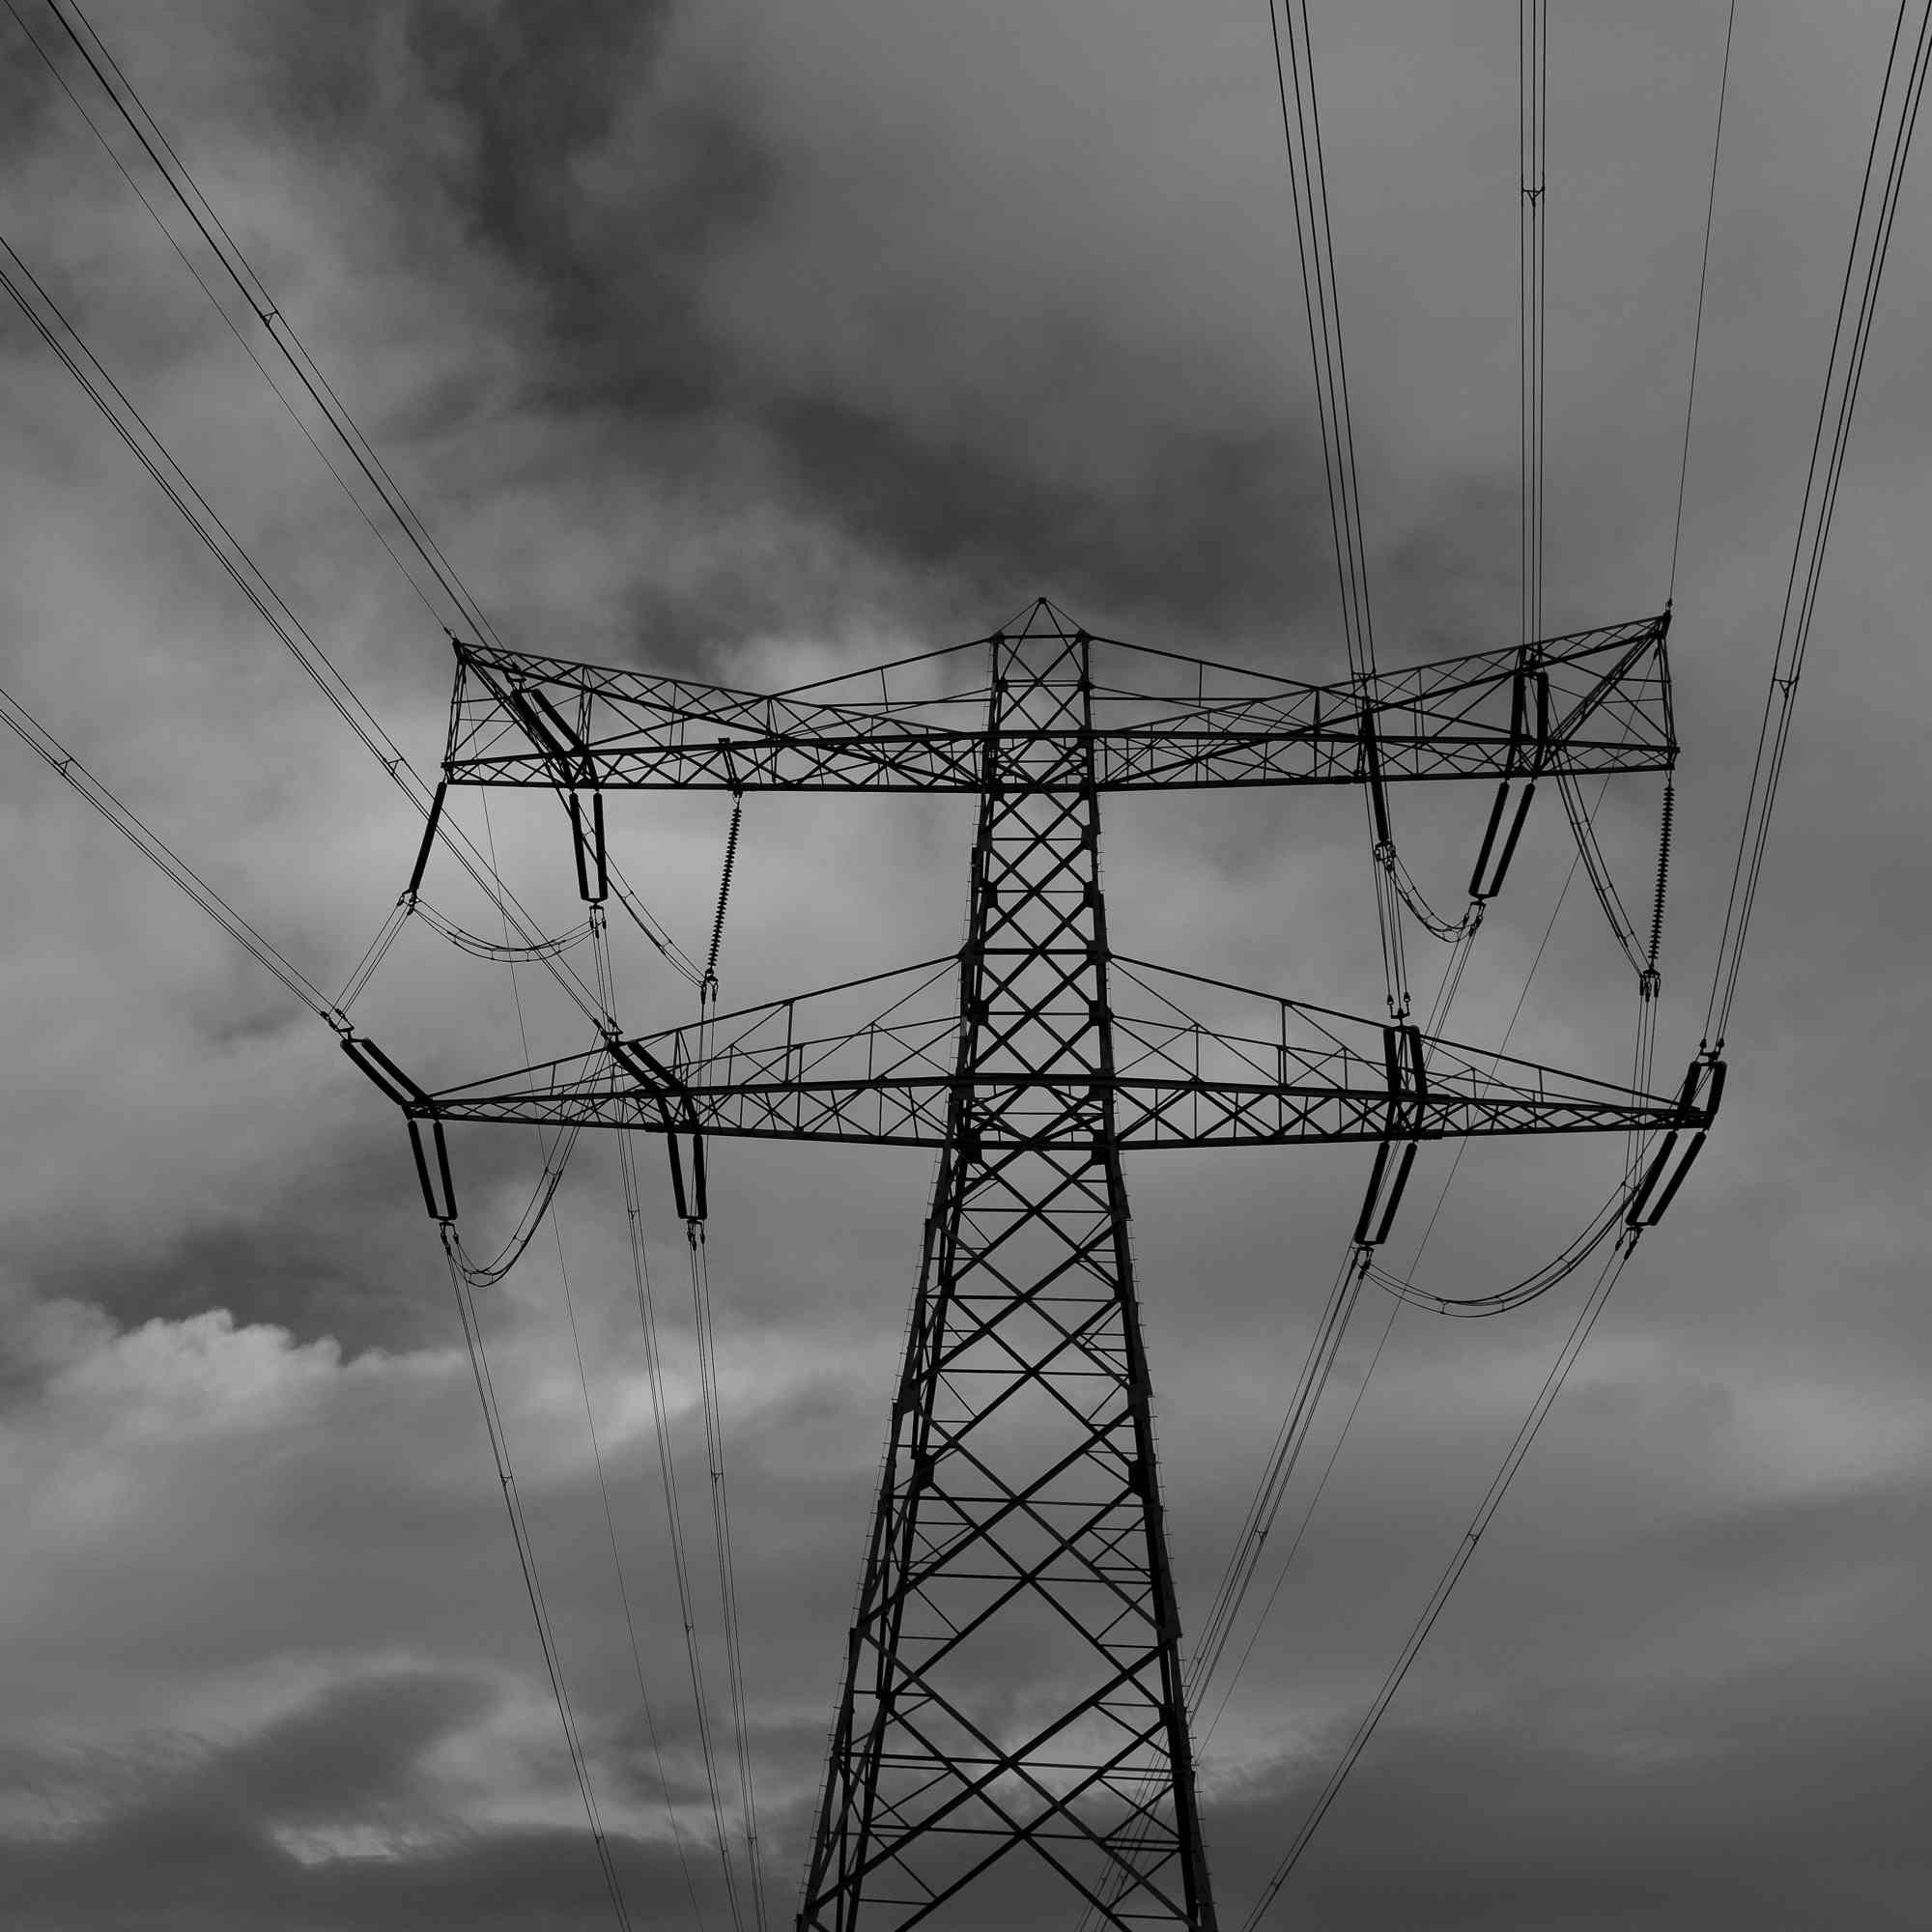 Powerlines and dark clouds